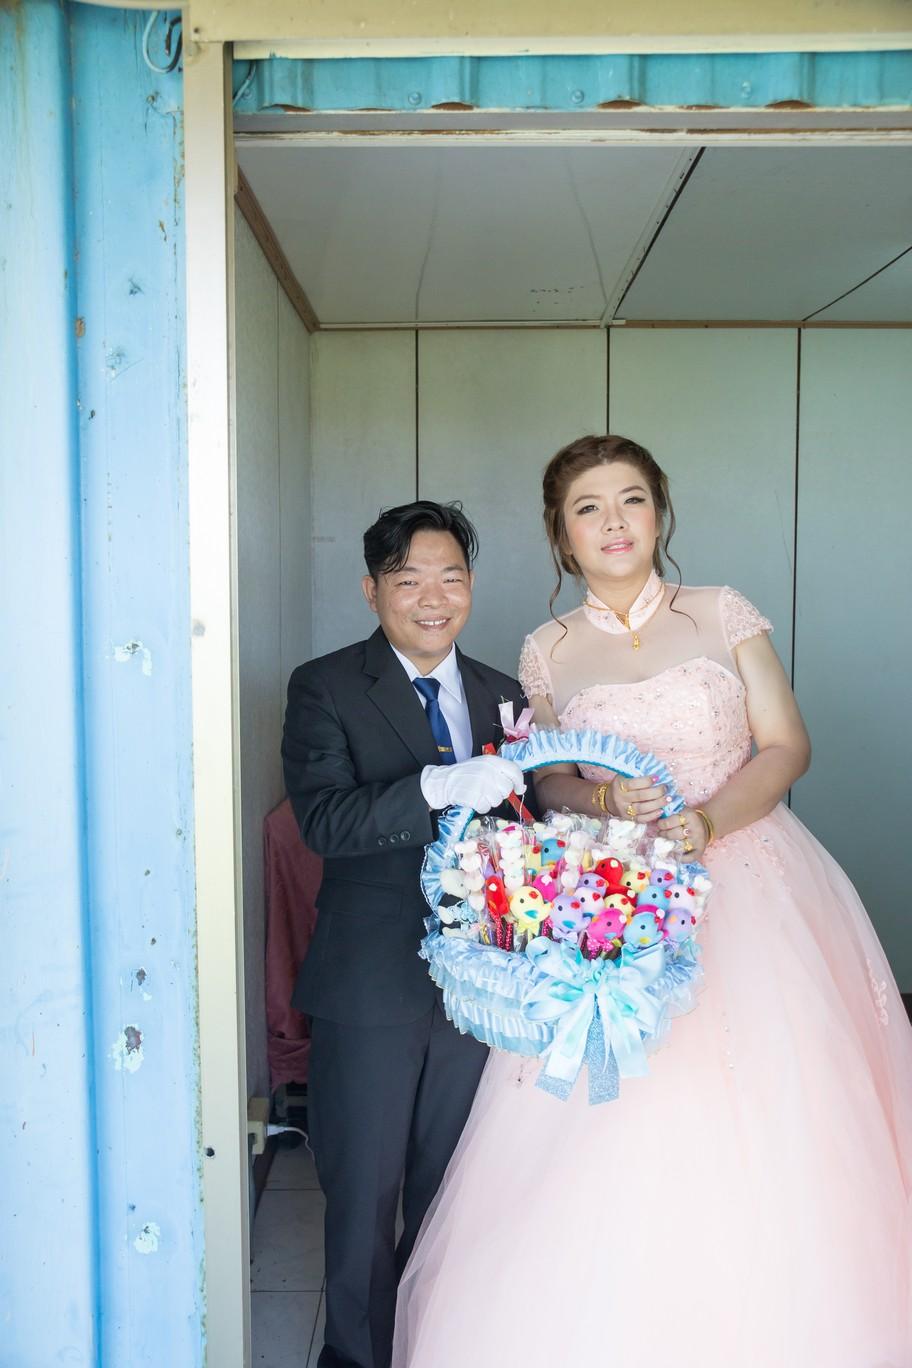 wedding-photo-555 - 桃園婚攝Ume-李優美《結婚吧》